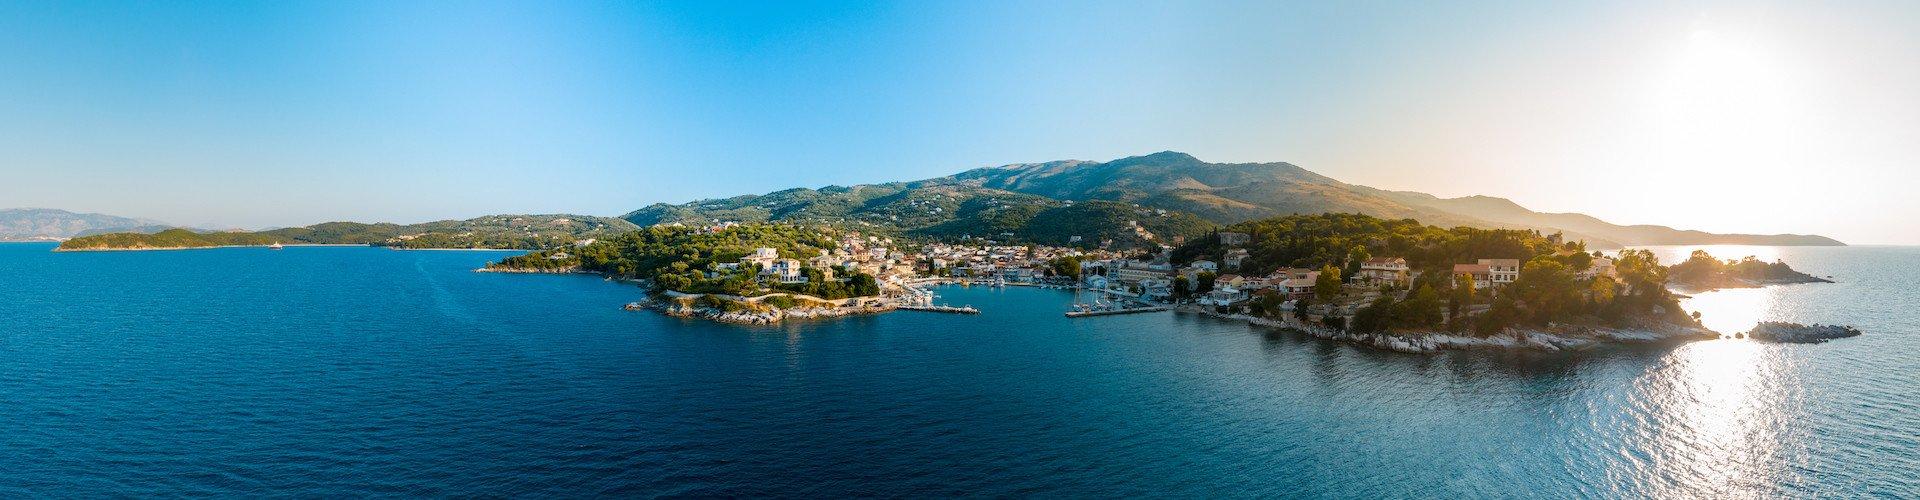 Familienurlaub auf Korfu